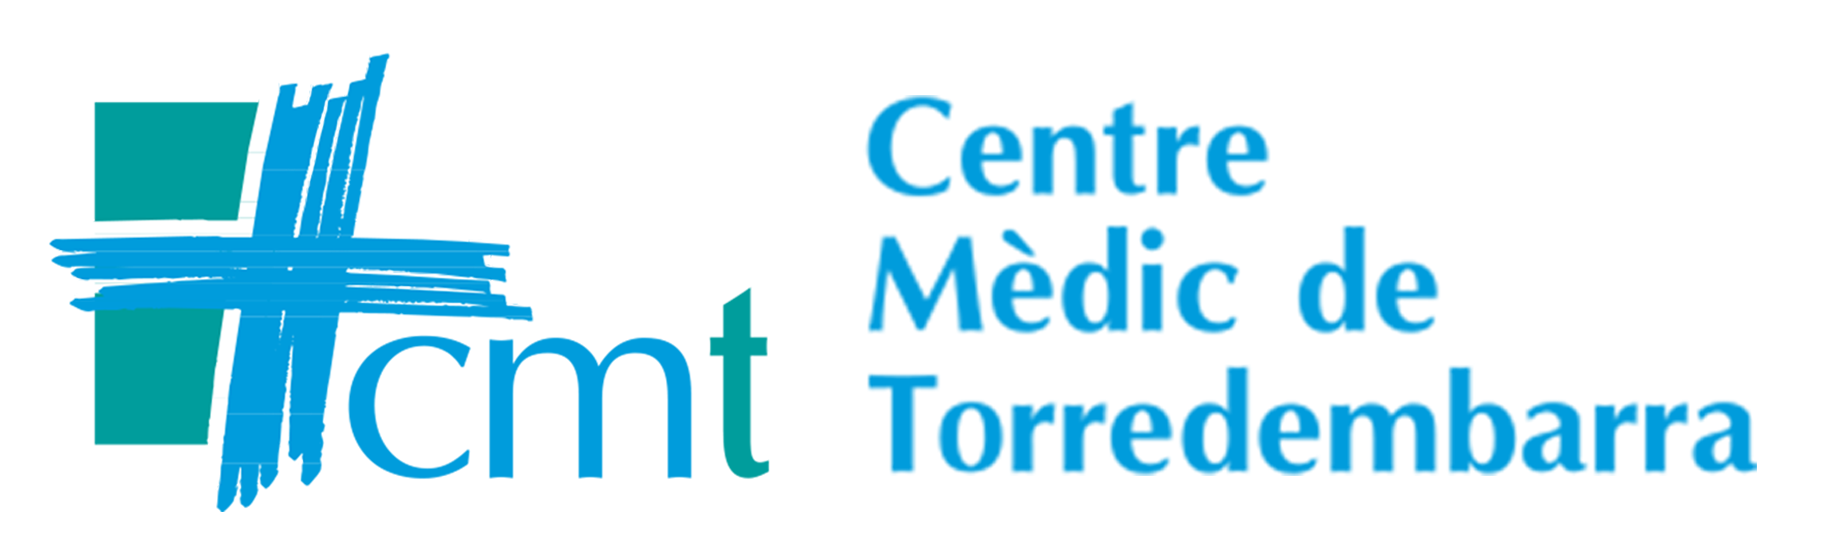 Centre Medic Torredembarra